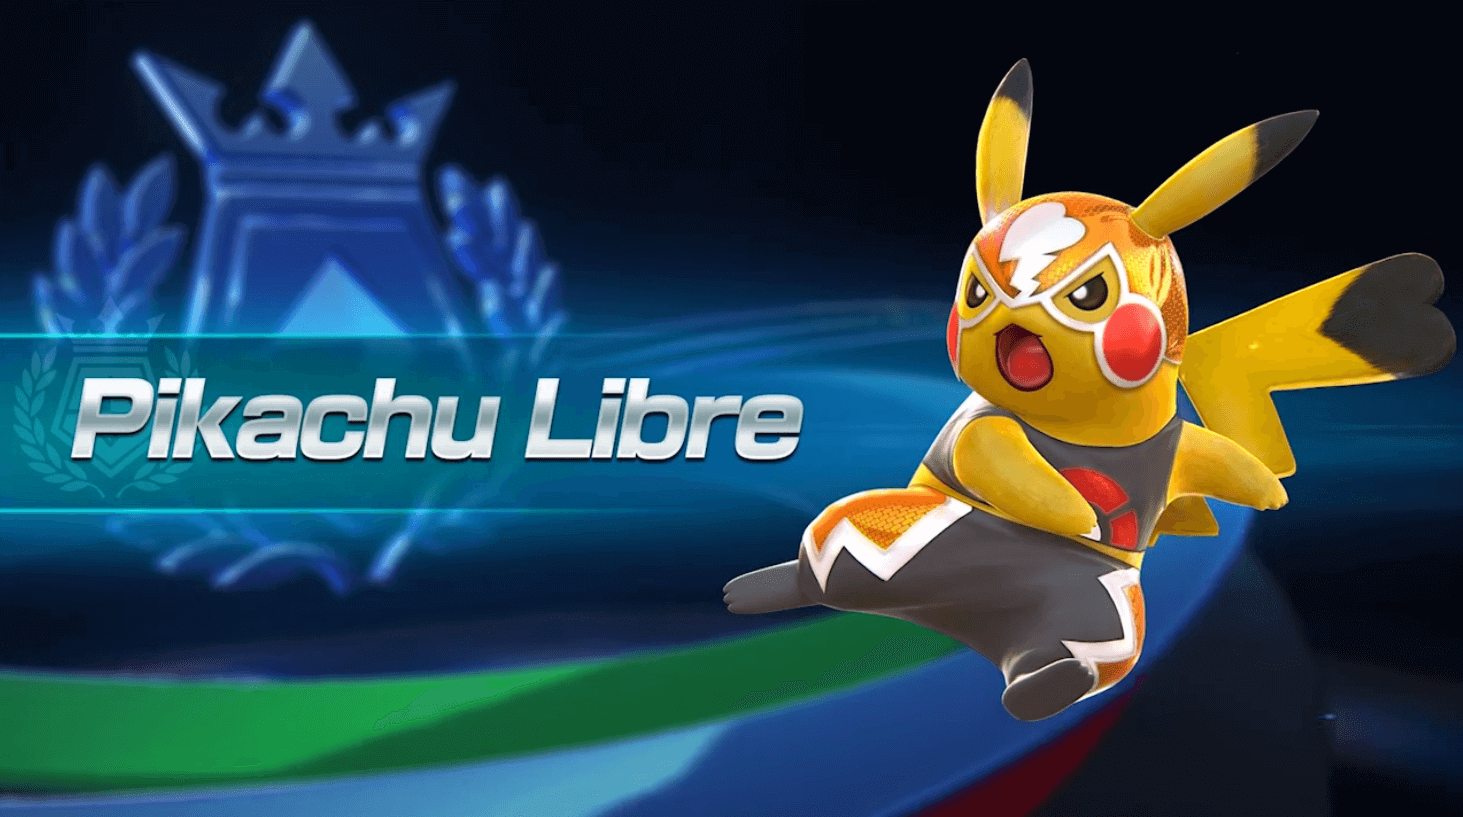 Lucha Libre Pikachu's Electrifying Move in Pokken Tournament Video